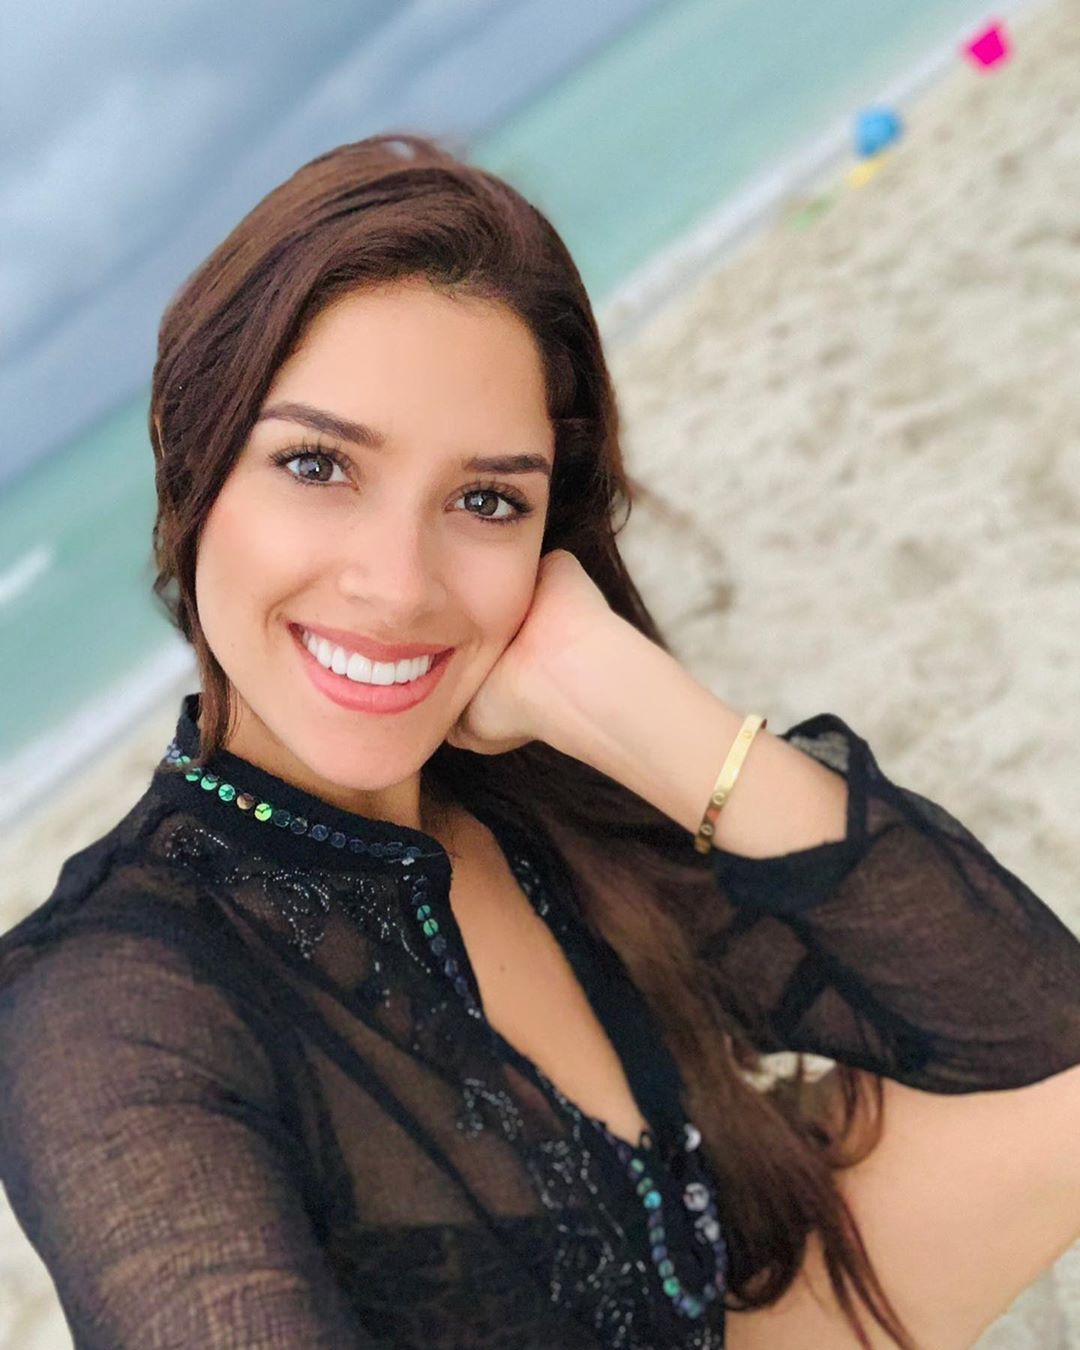 angella escudero, miss world peru 2019. - Página 2 74704910